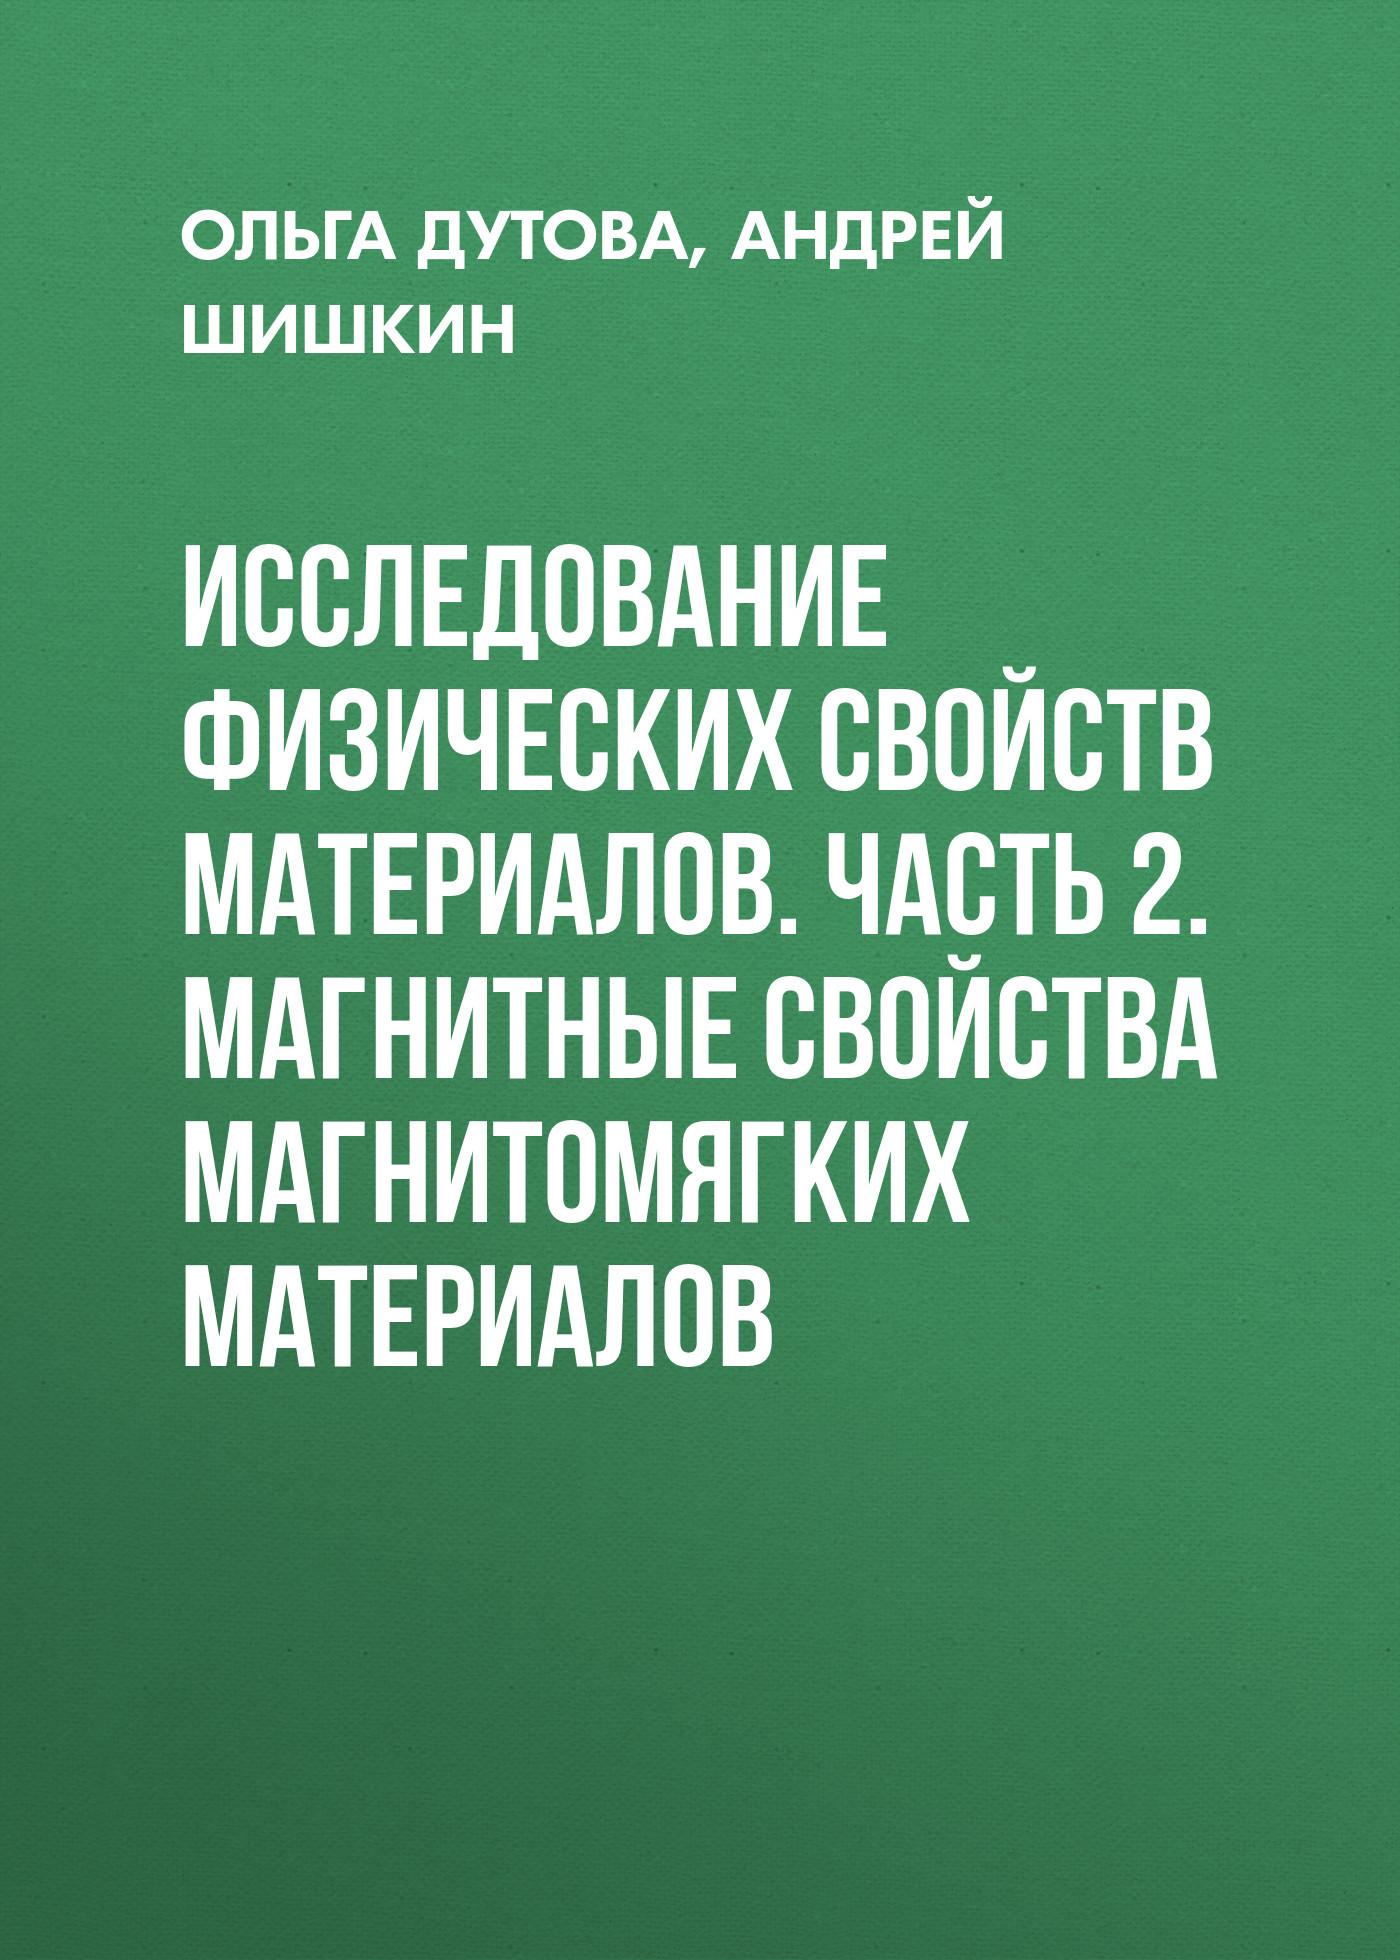 Андрей Шишкин бесплатно